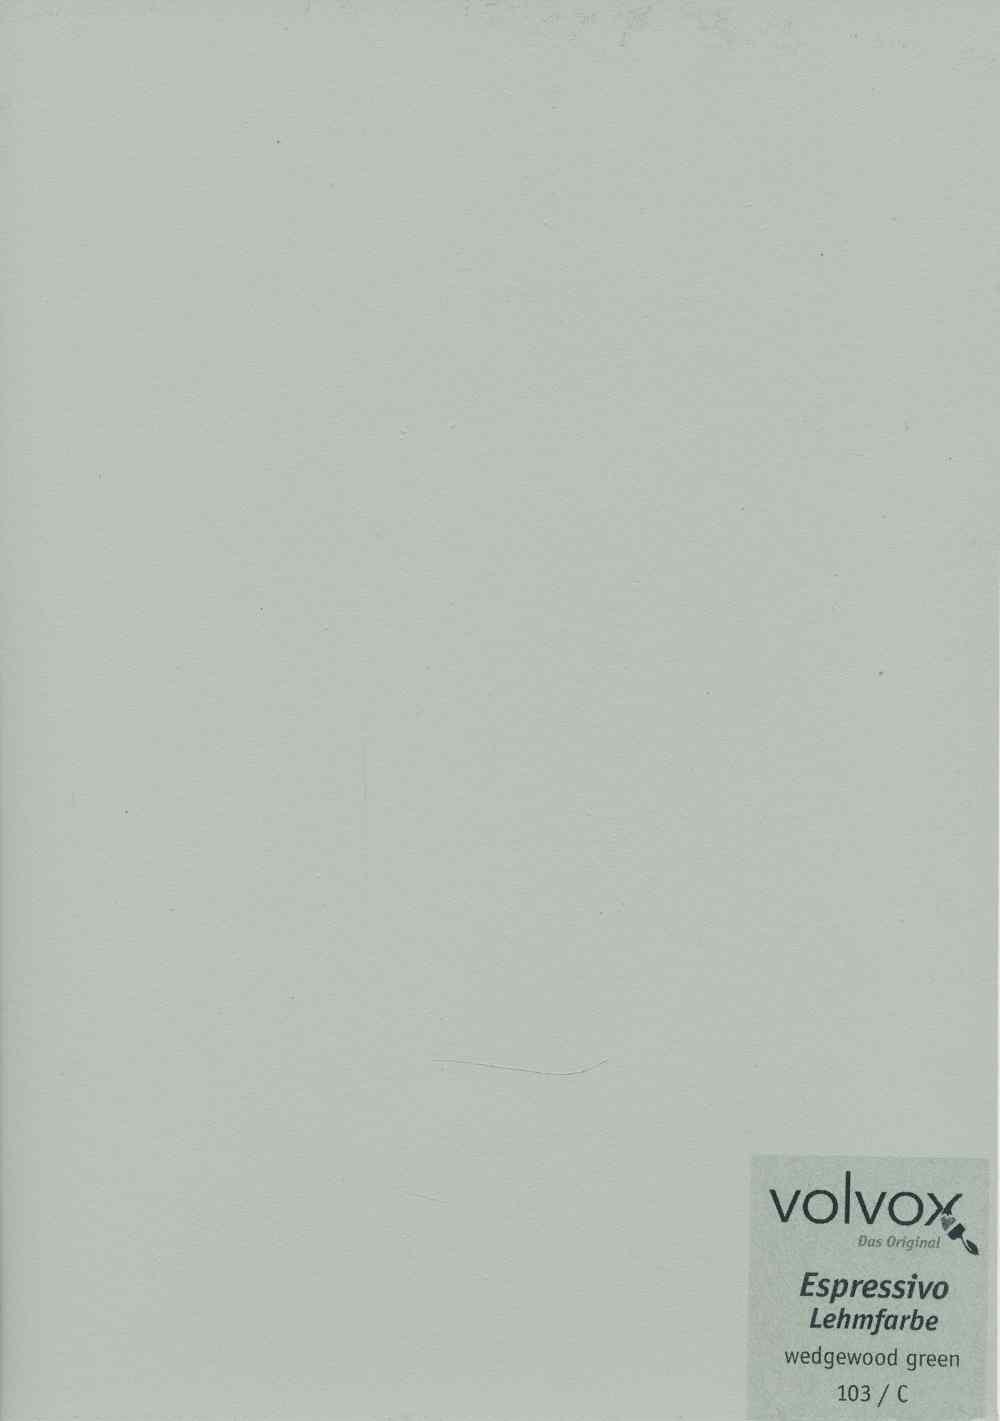 Volvox Espressivo Lehmfarbe 103 wedgewood green